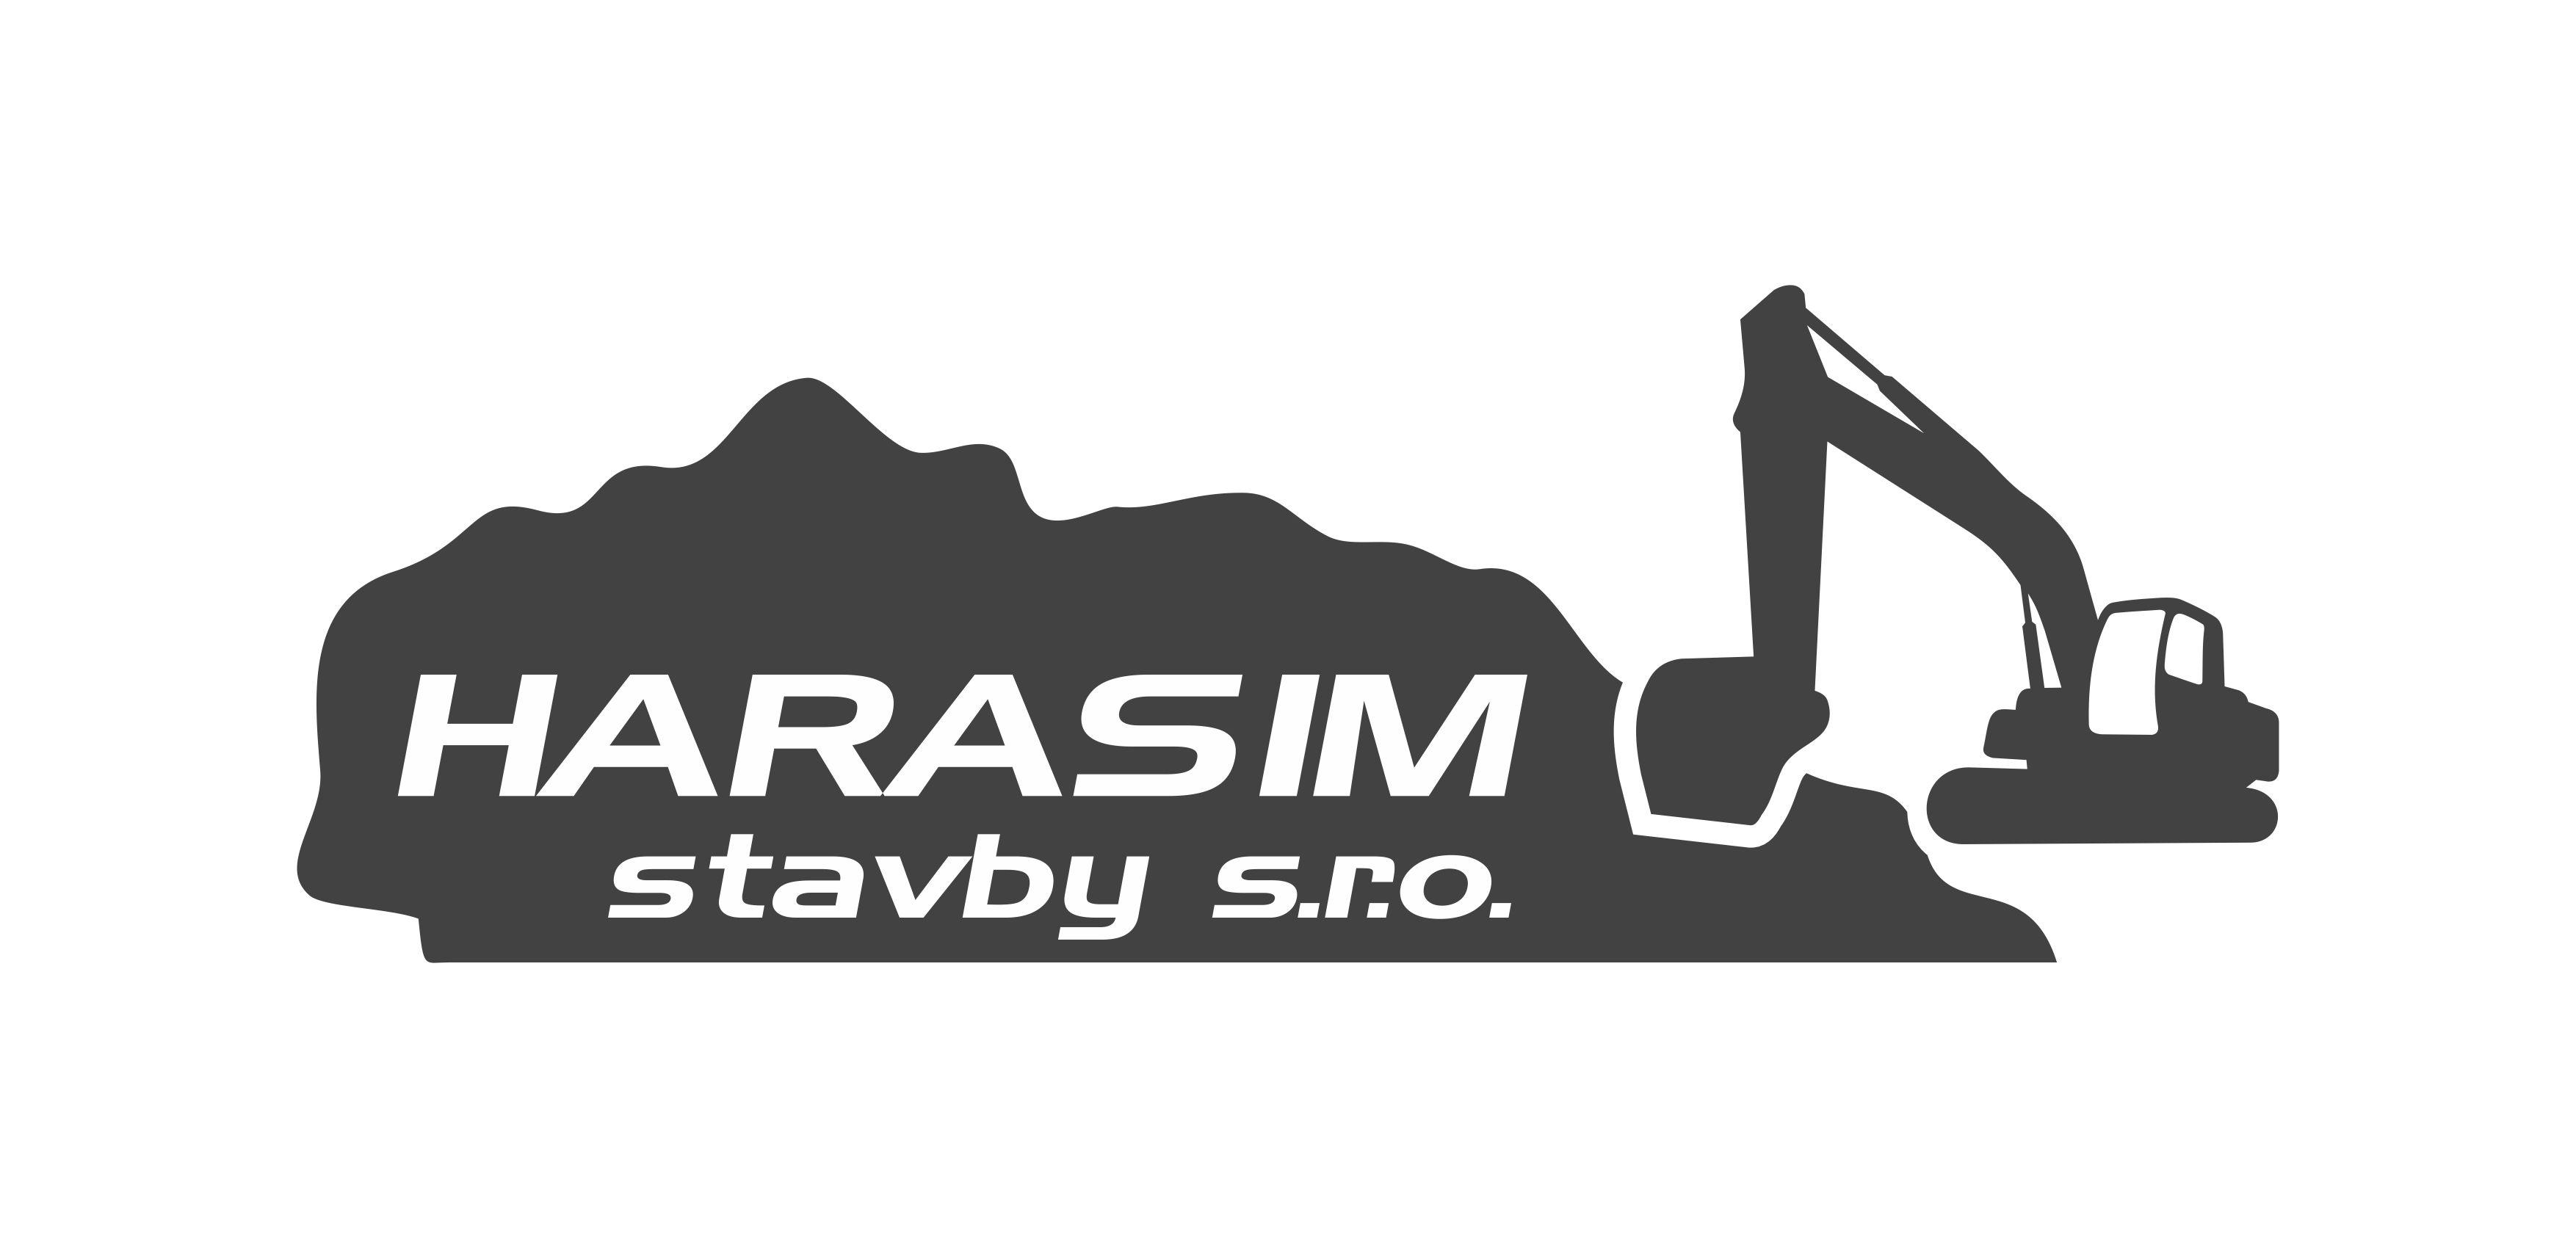 logo firmy HARASIM stavby s.r.o.